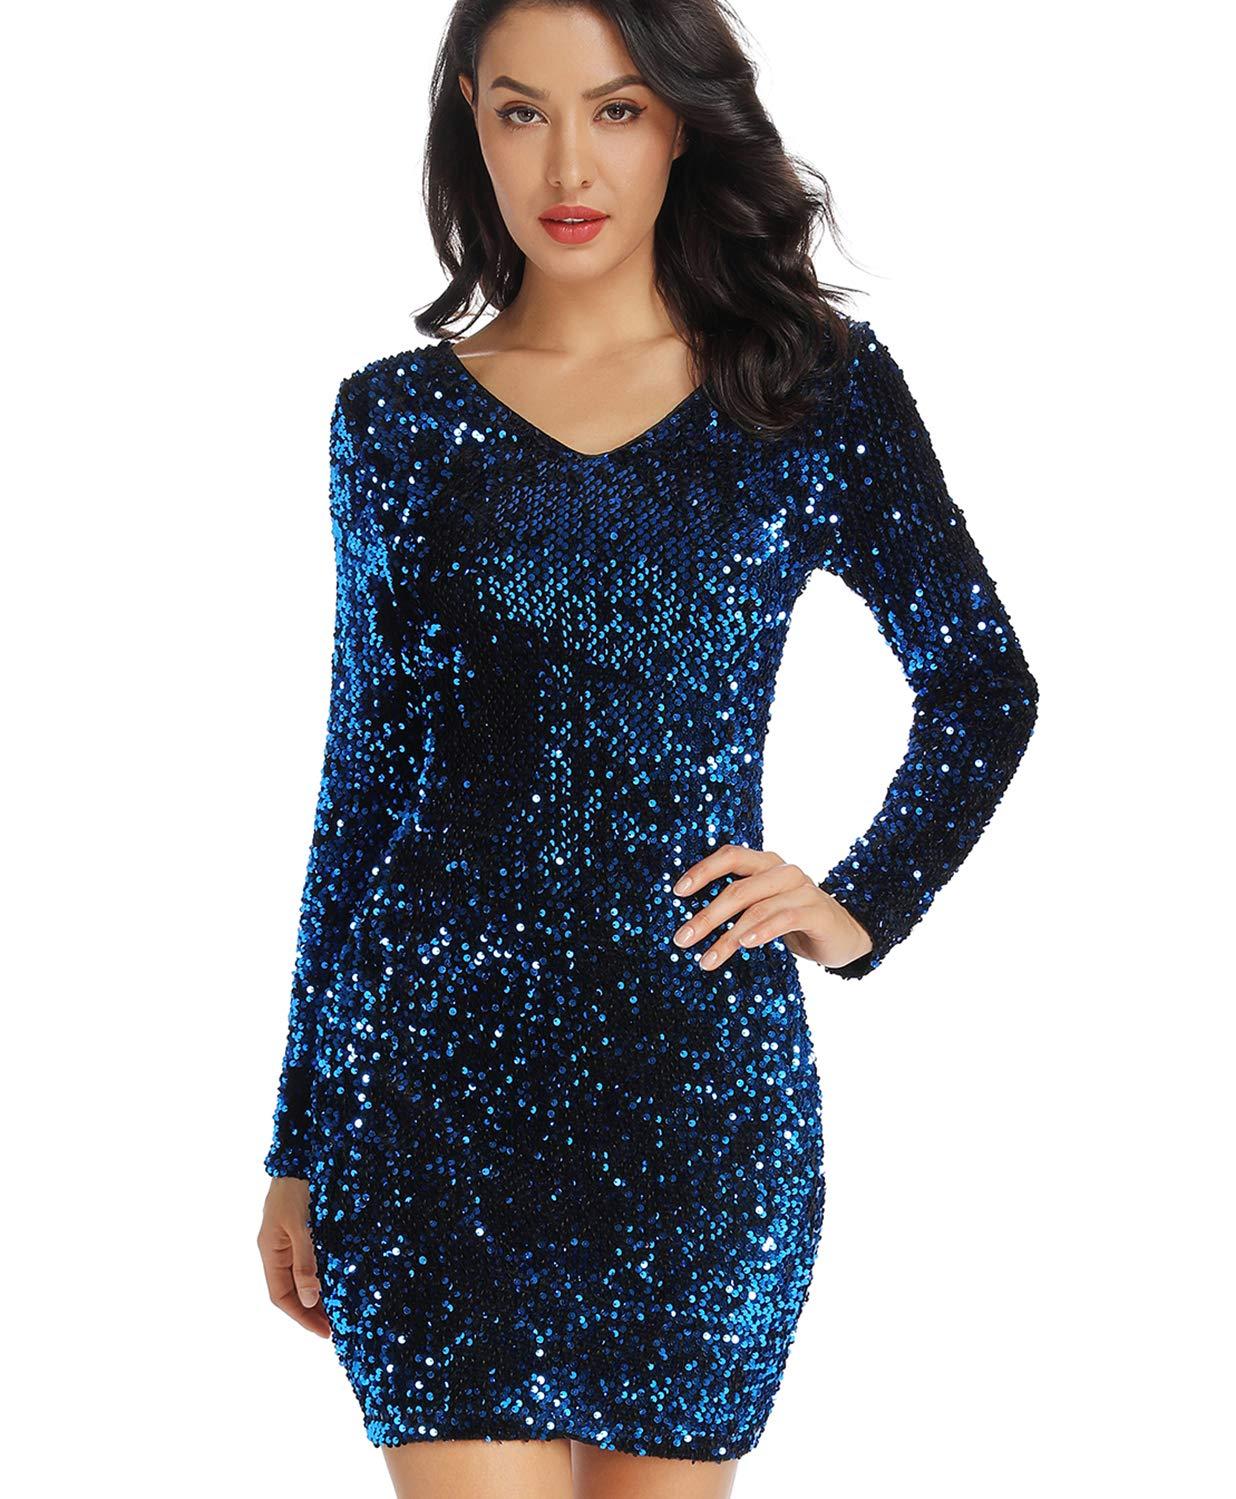 Available at Amazon: LLmansha Women's Sparkle Glitzy Glam Sequin V Neck Long Sleeve Flapper Party Club Dress